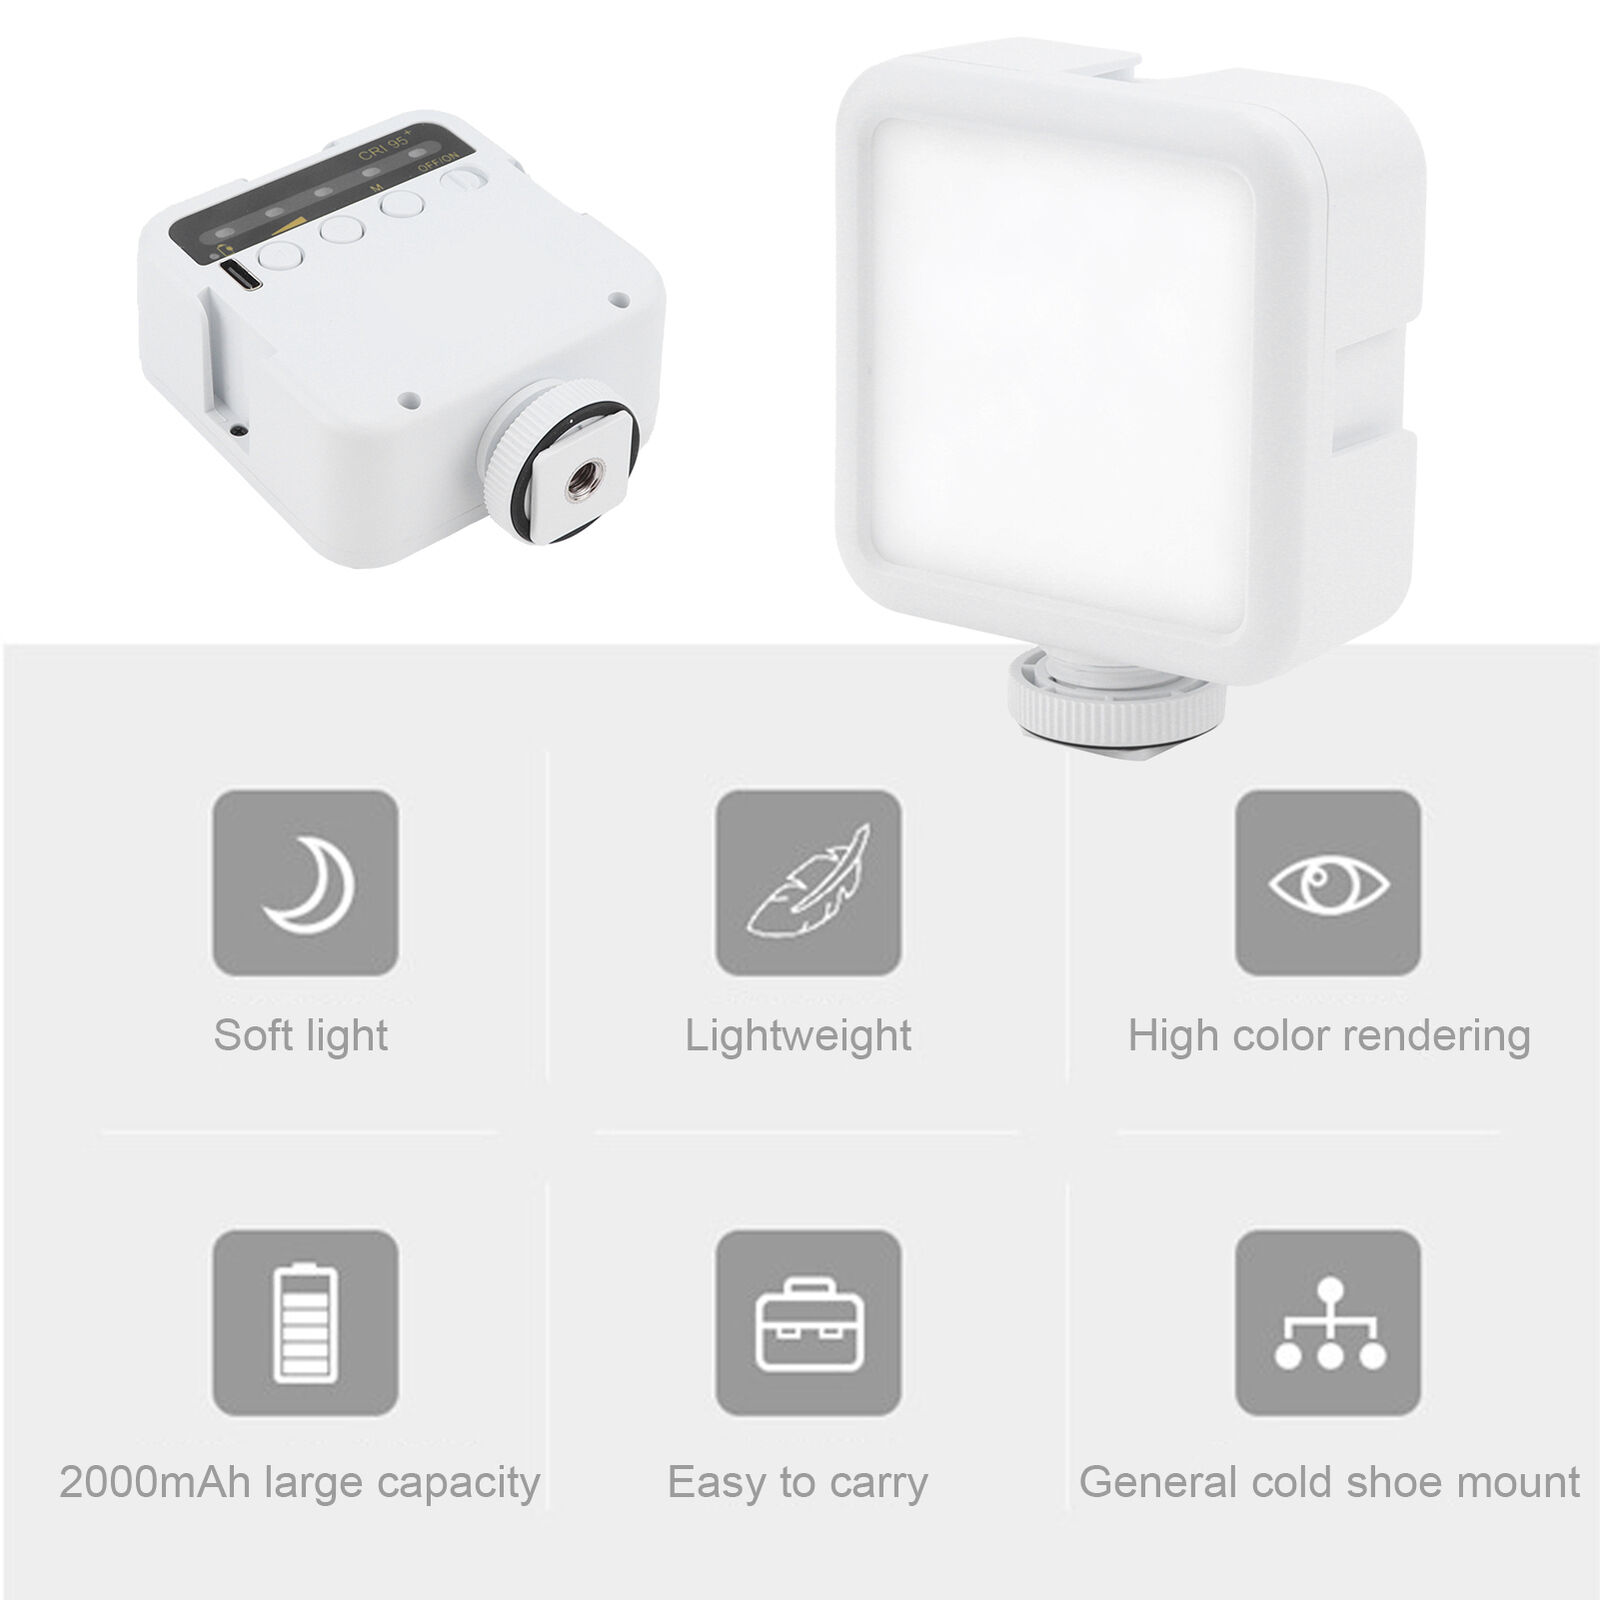 ULANZI VL49 60 Degree Adjust Action Camera Phone Fill Light LED Lamp Dimmable